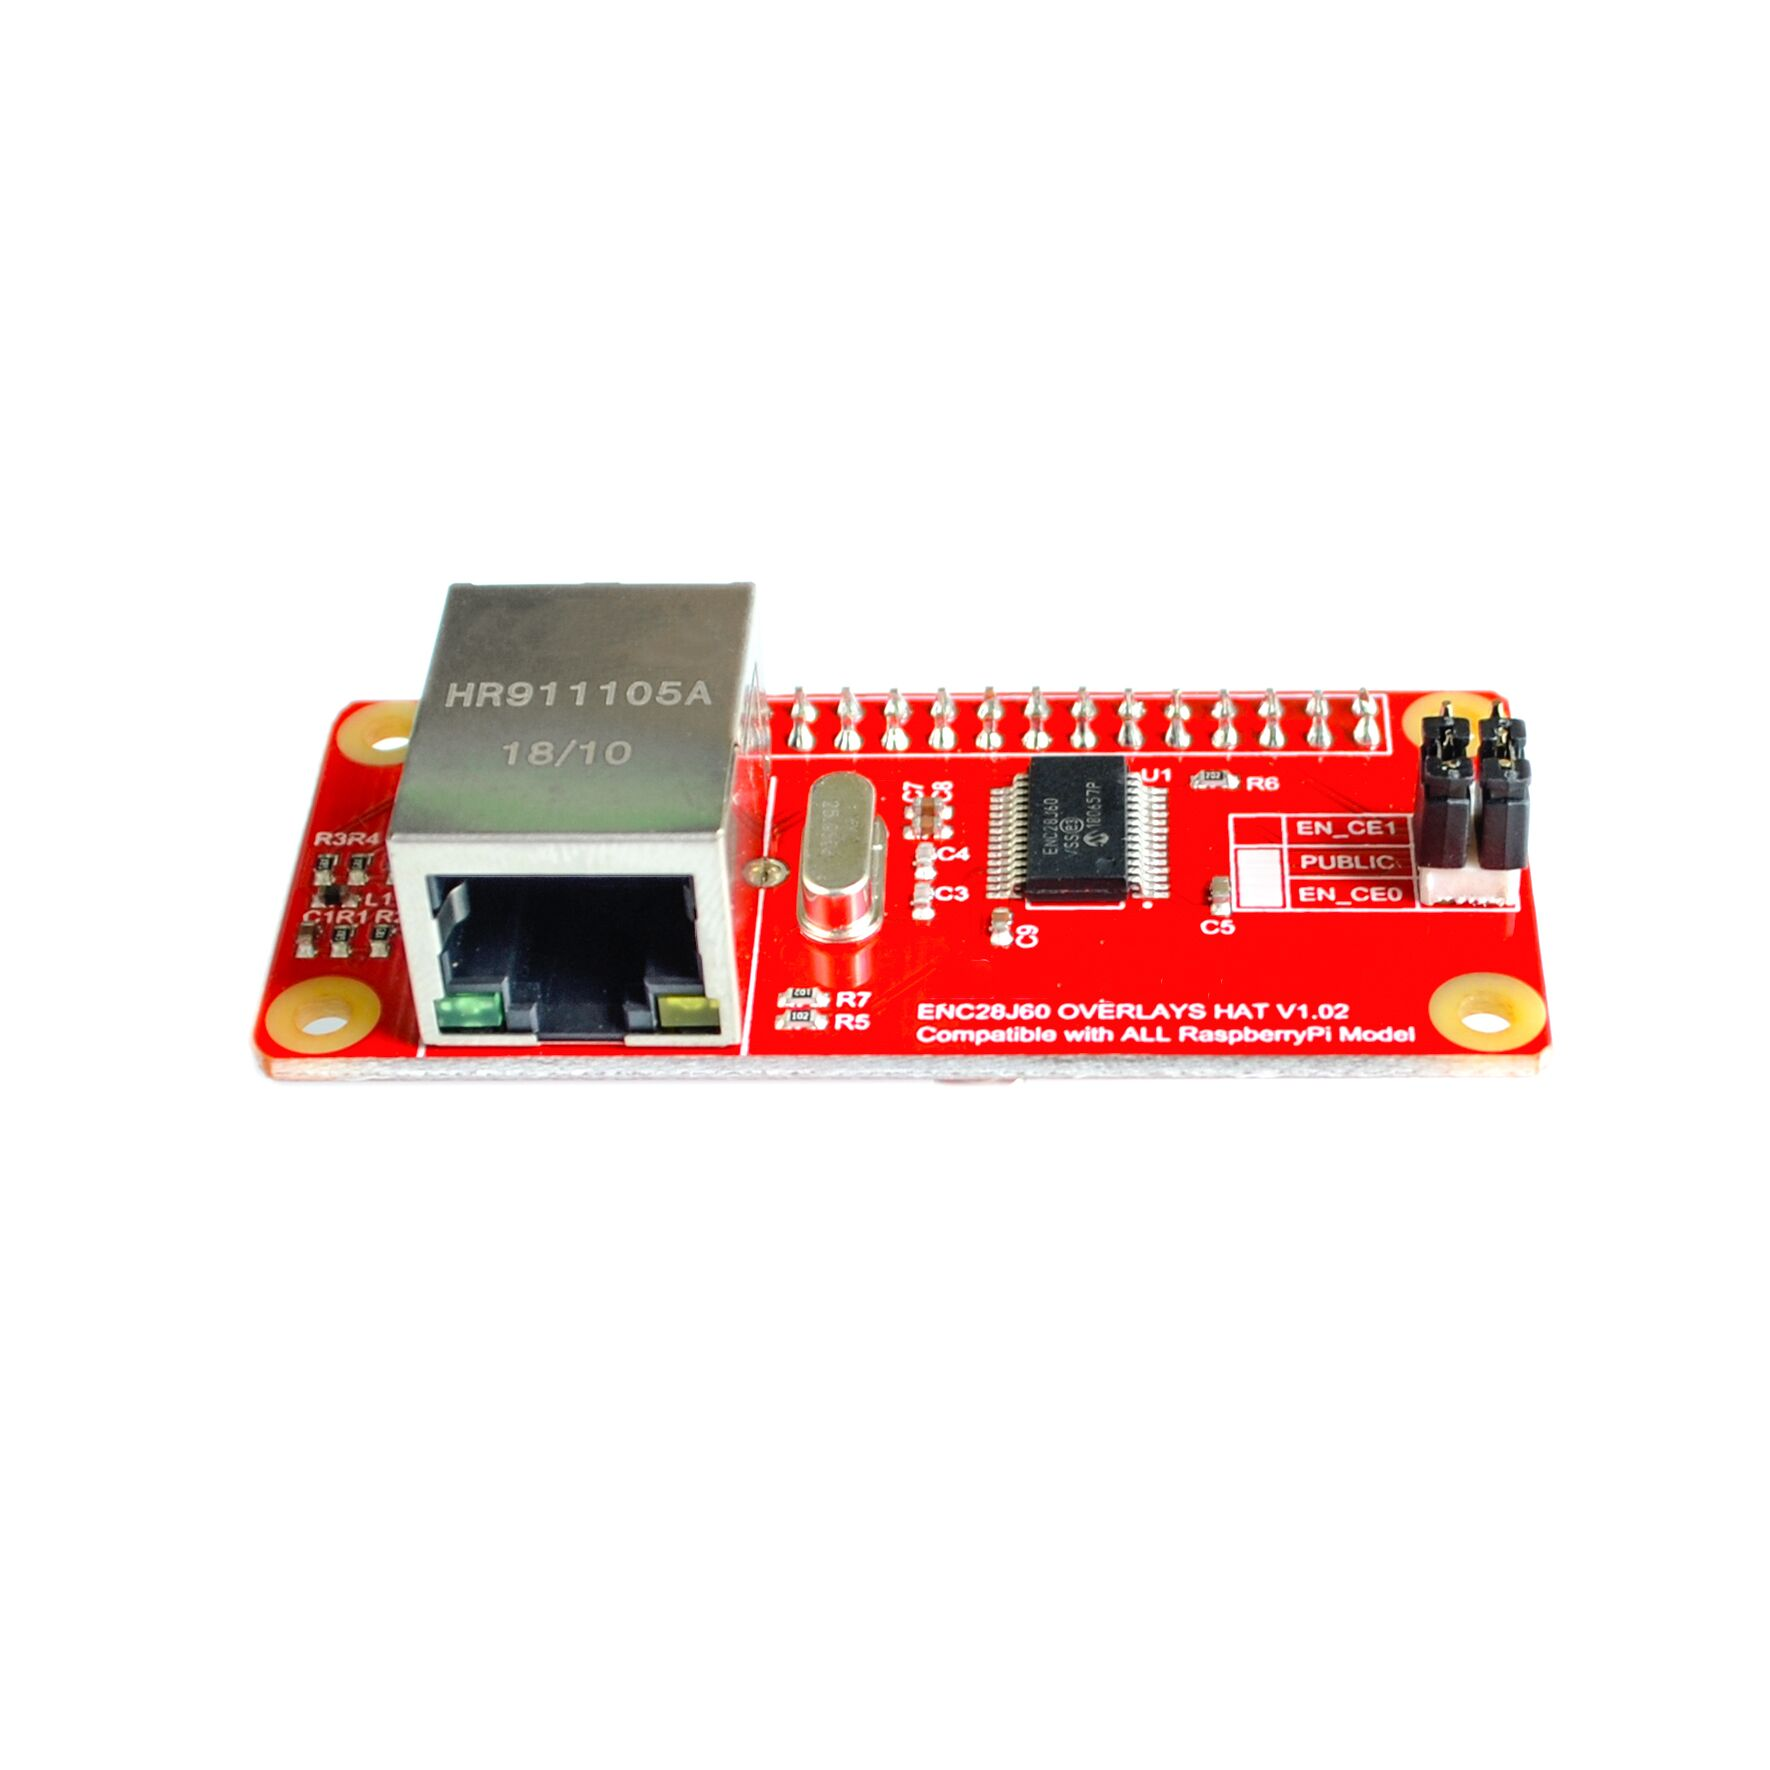 ENC28J60 Network Adapter Module for Raspberry Pi ZeroENC28J60 Network Adapter Module for Raspberry Pi Zero